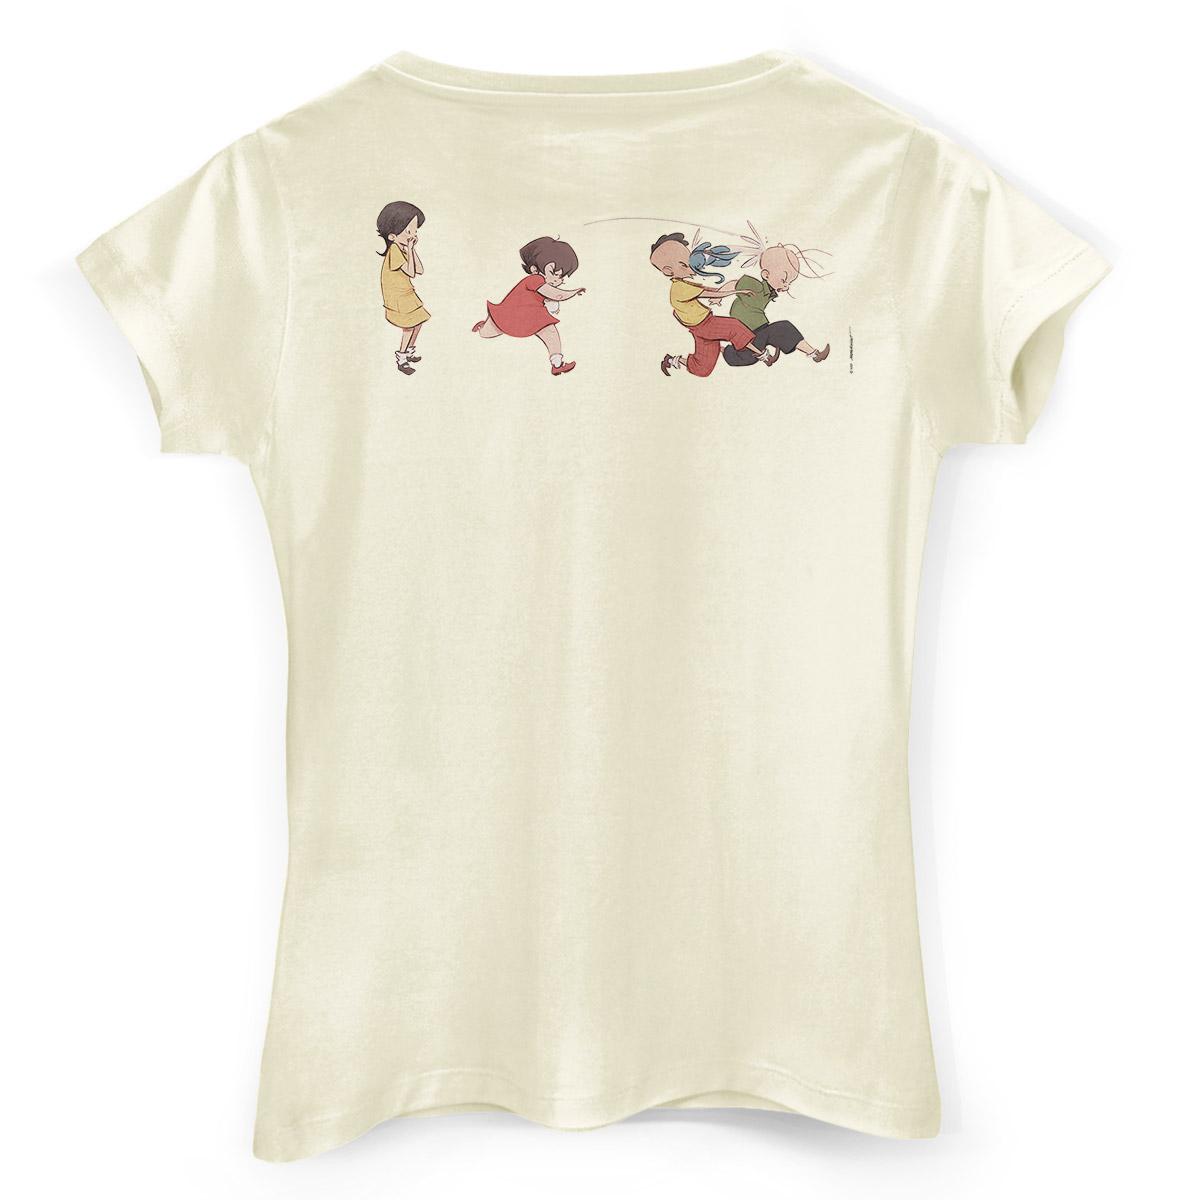 Camiseta Feminina Turma da Mônica Lições